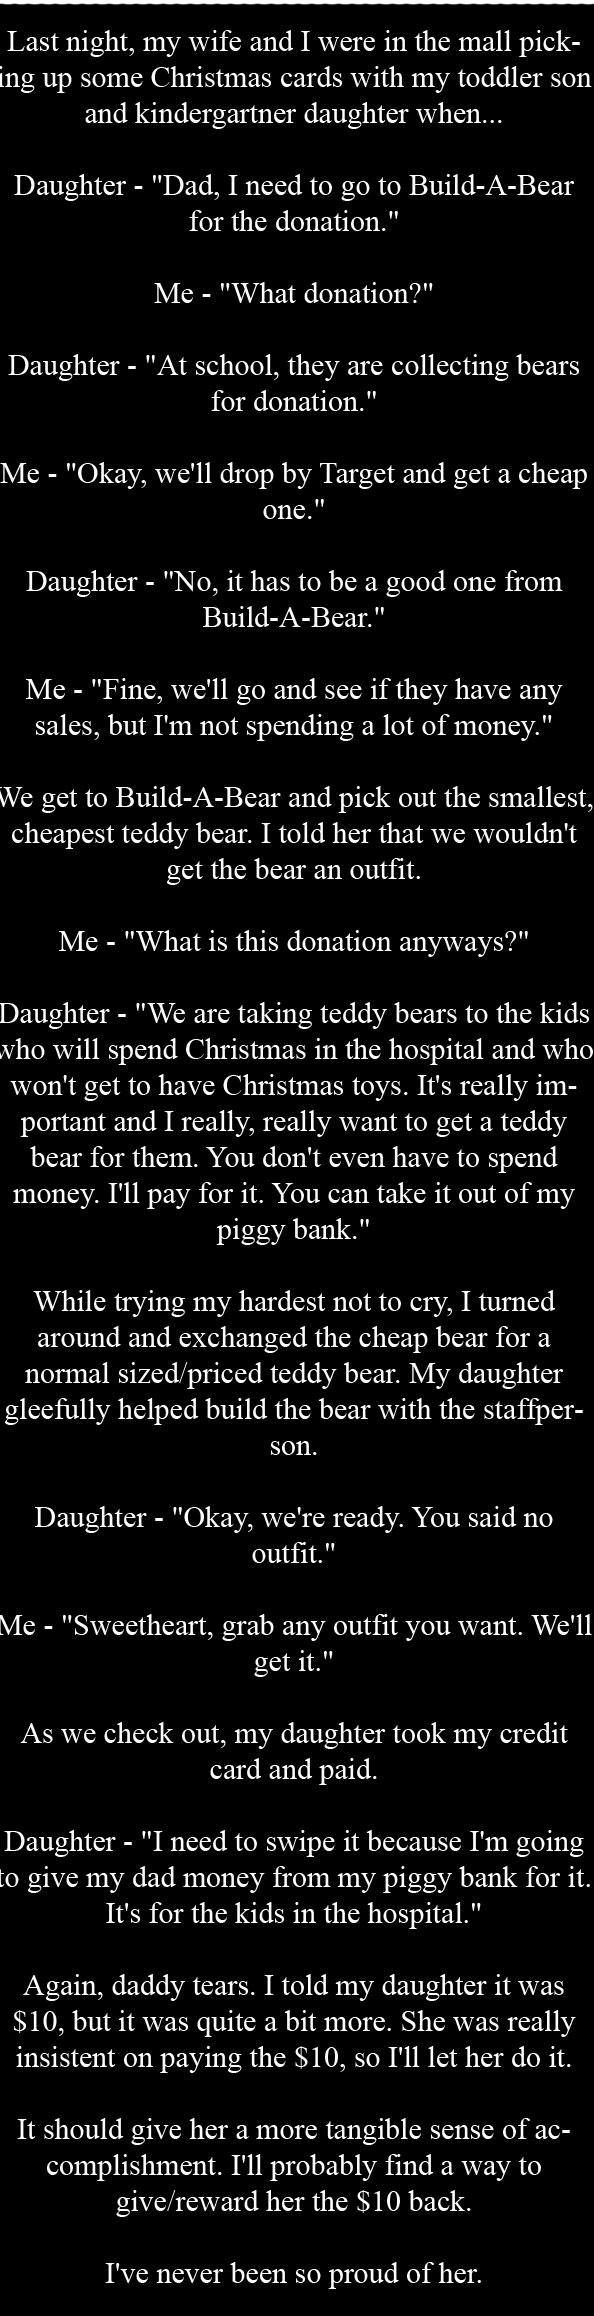 heartwarming